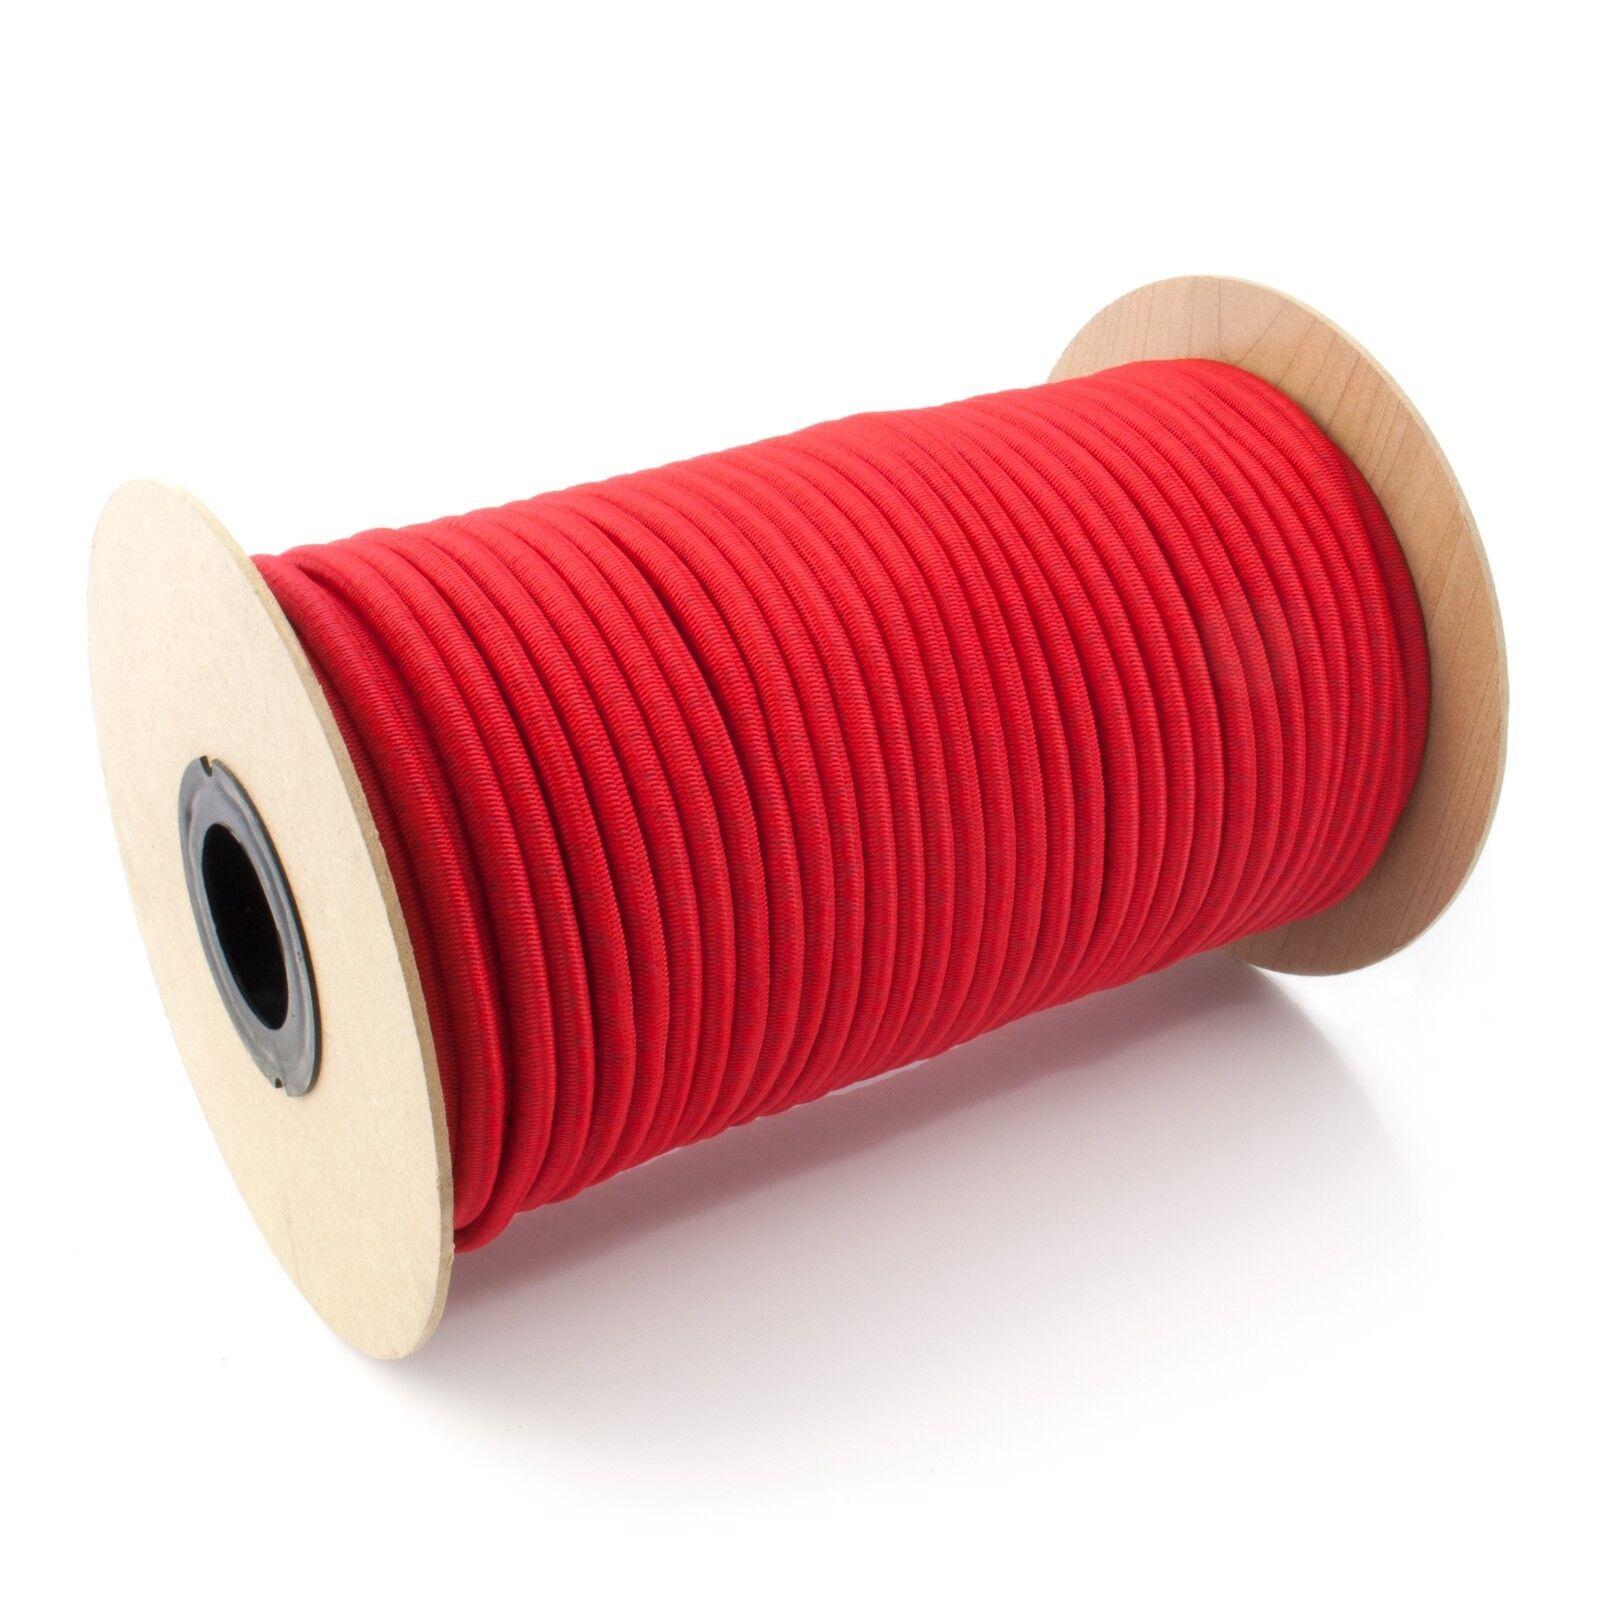 6mm GUMMISEIL 100m ROT Expanderseil Gummileine Expander Planenspanner Gummi